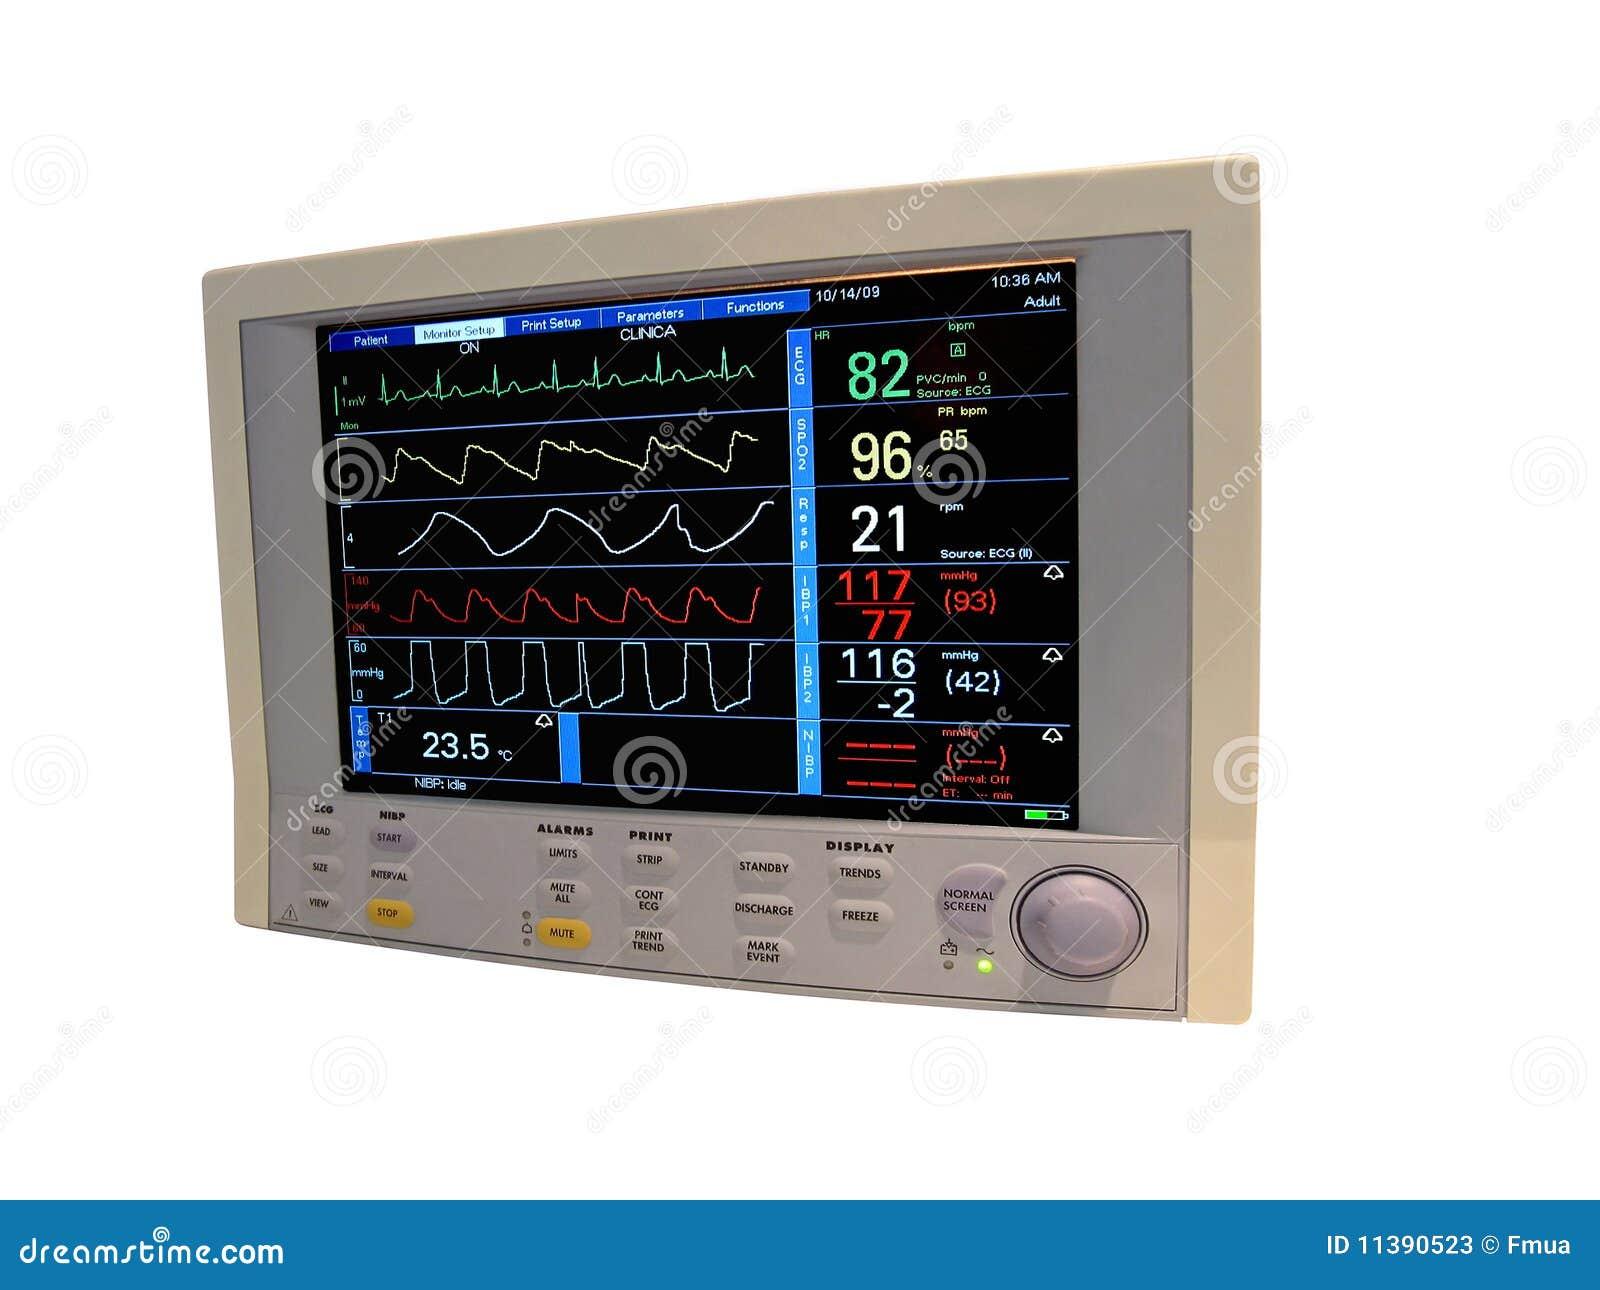 color cardiovascular monitor, doppler, diagnostic